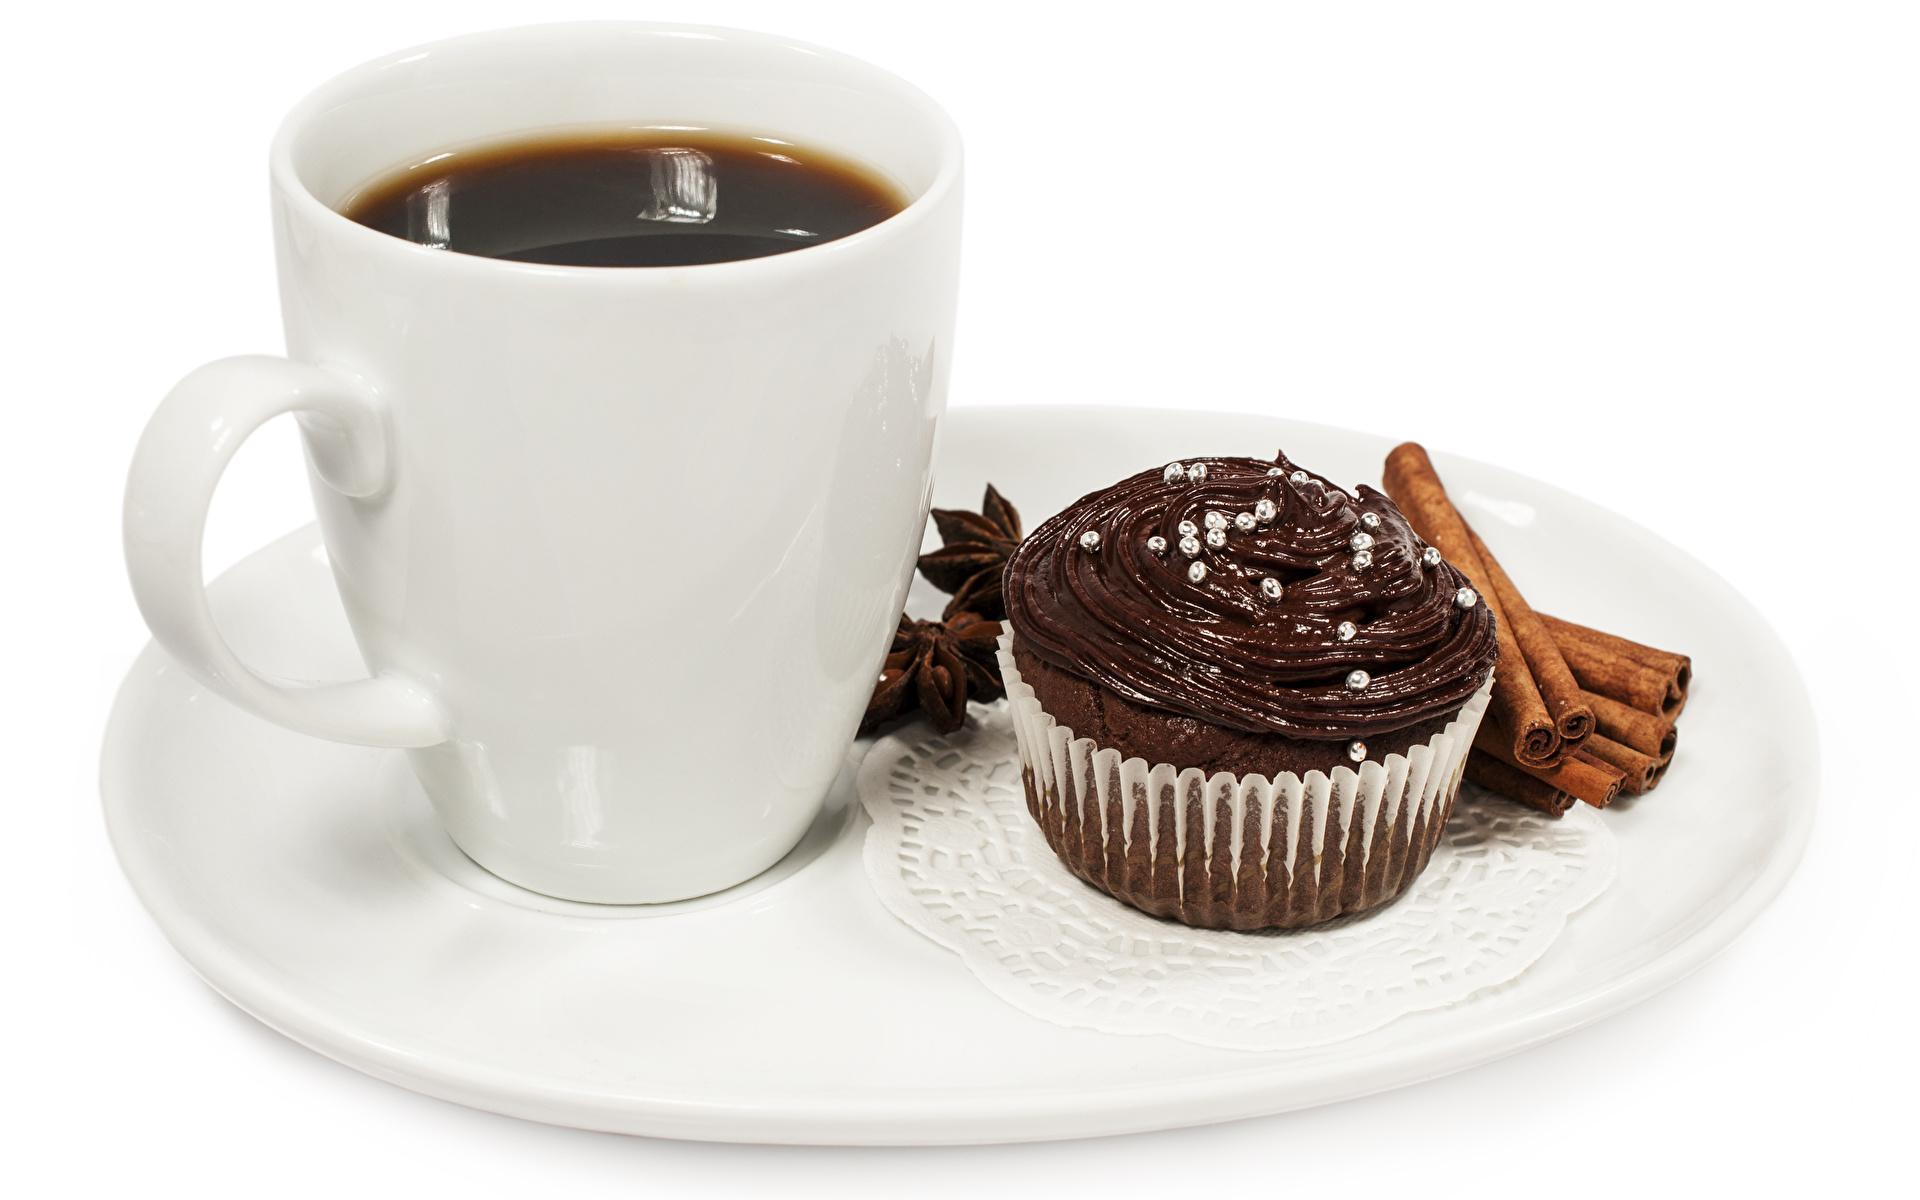 Обои Шоколад Кофе Корица Еда Чашка Тарелка Пирожное Белый фон 1920x1200 Пища чашке тарелке Продукты питания